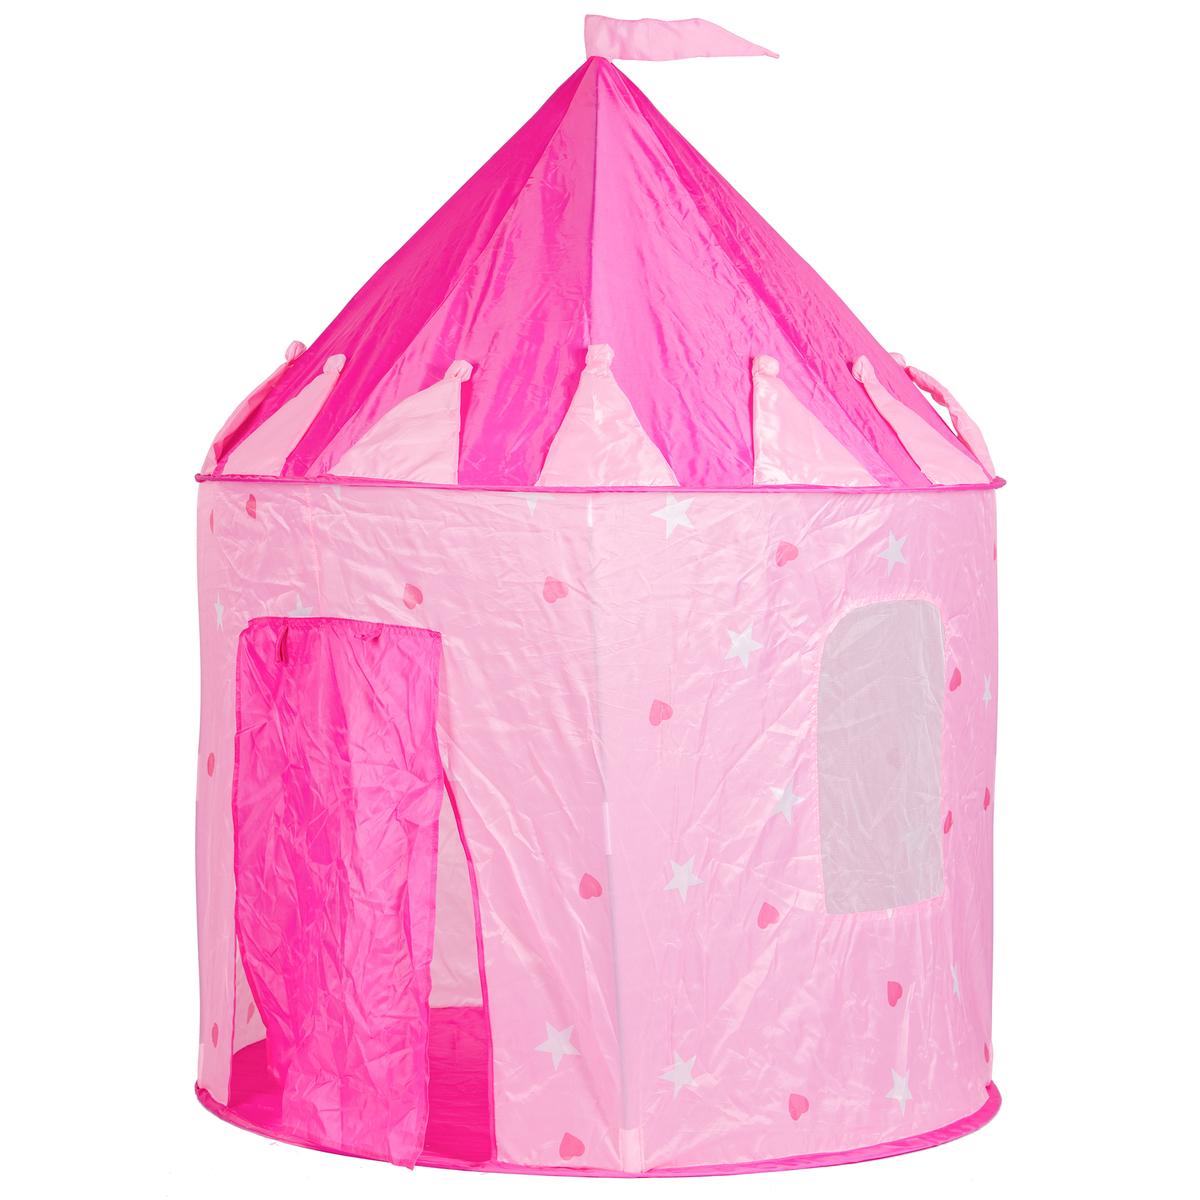 Detský stan - Palác pre princezné Pink castle tent